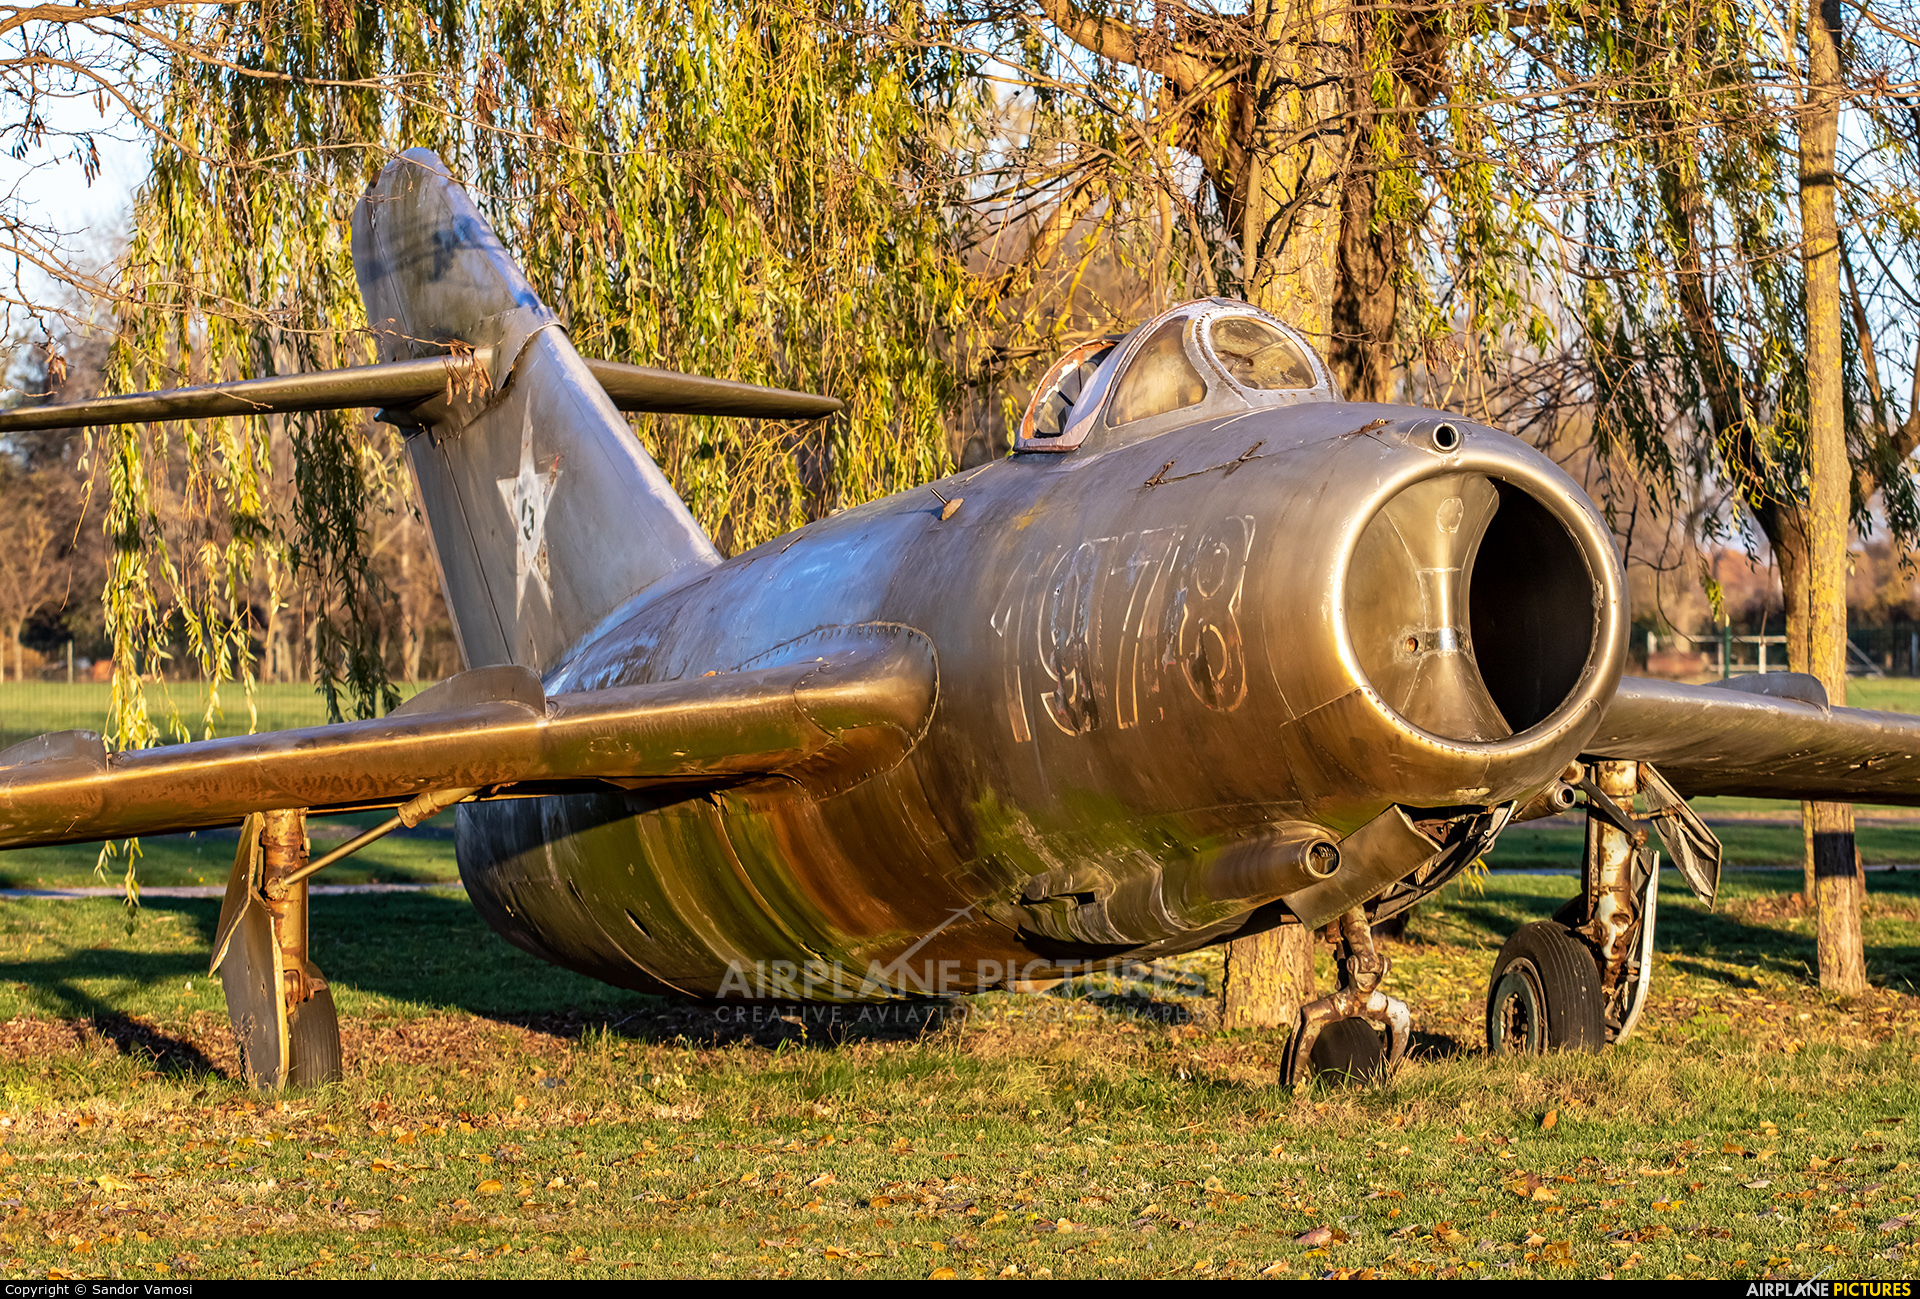 Hungary - Air Force 814 aircraft at Jakabszállás